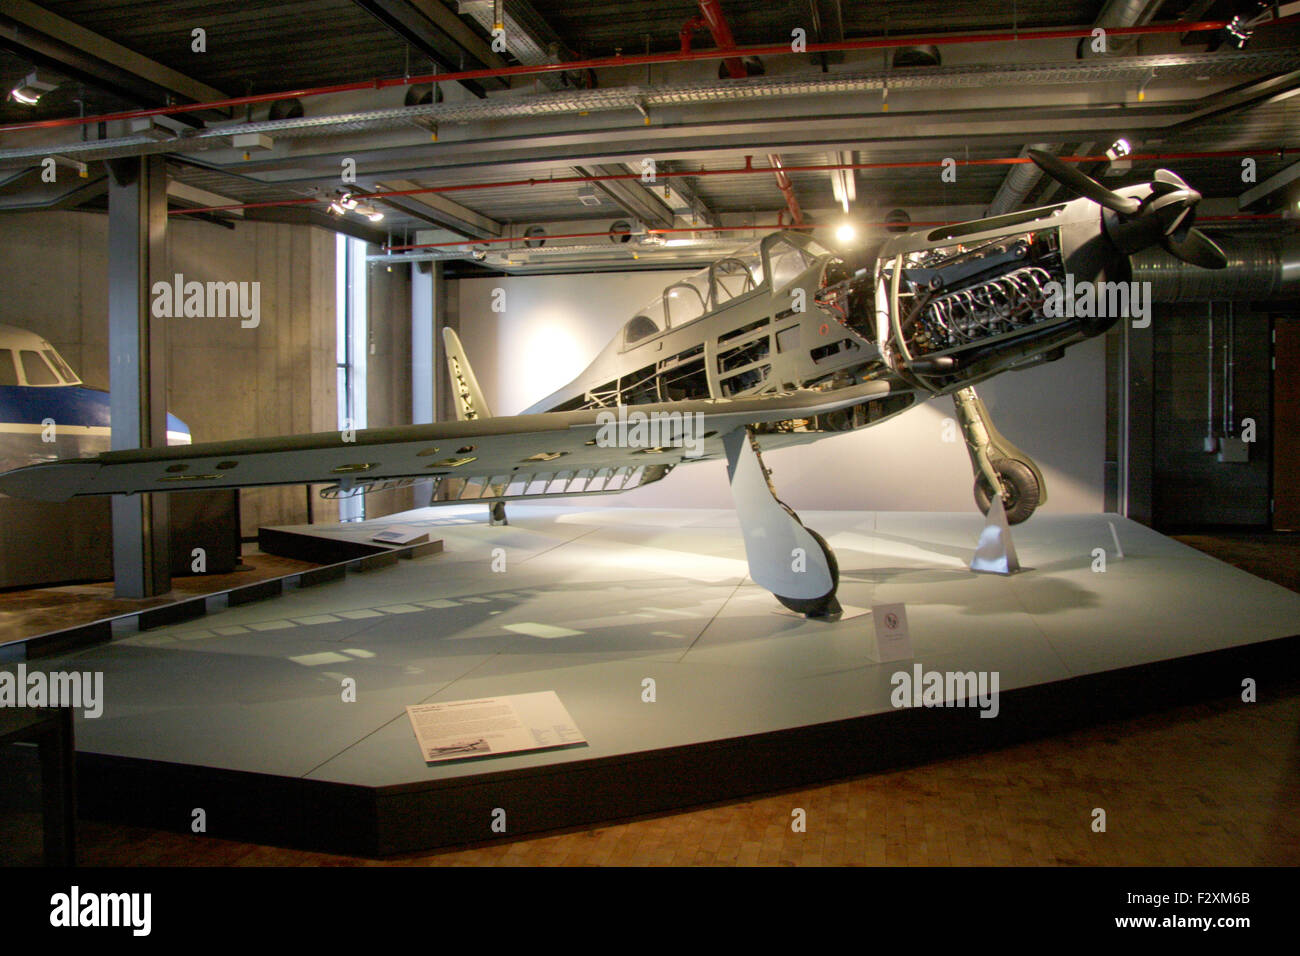 Flugzeug - Deutsches Technikmuseum, Berlin-Kreuzberg. - Stock Image